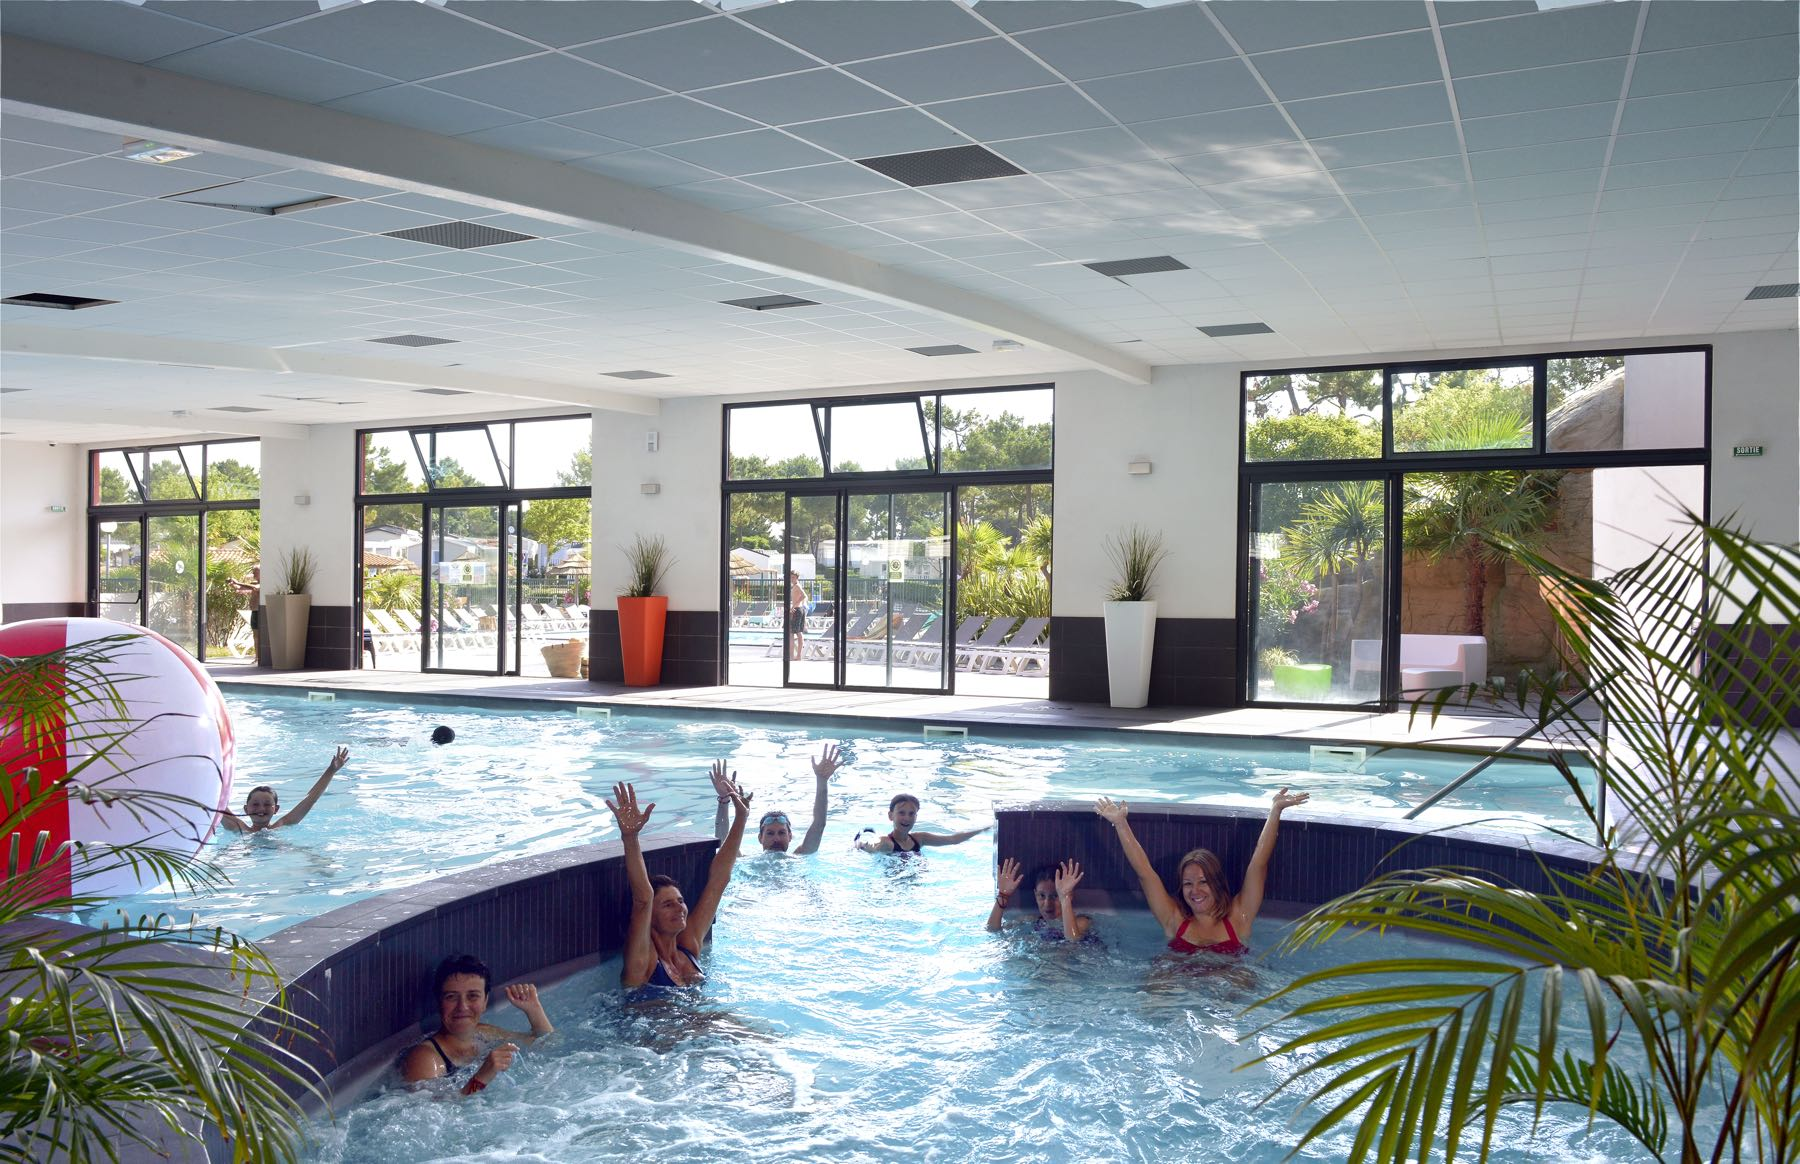 camping-vendee-piscine-interieure-chauffee-saint-jean-de-monts-the-Tropicana